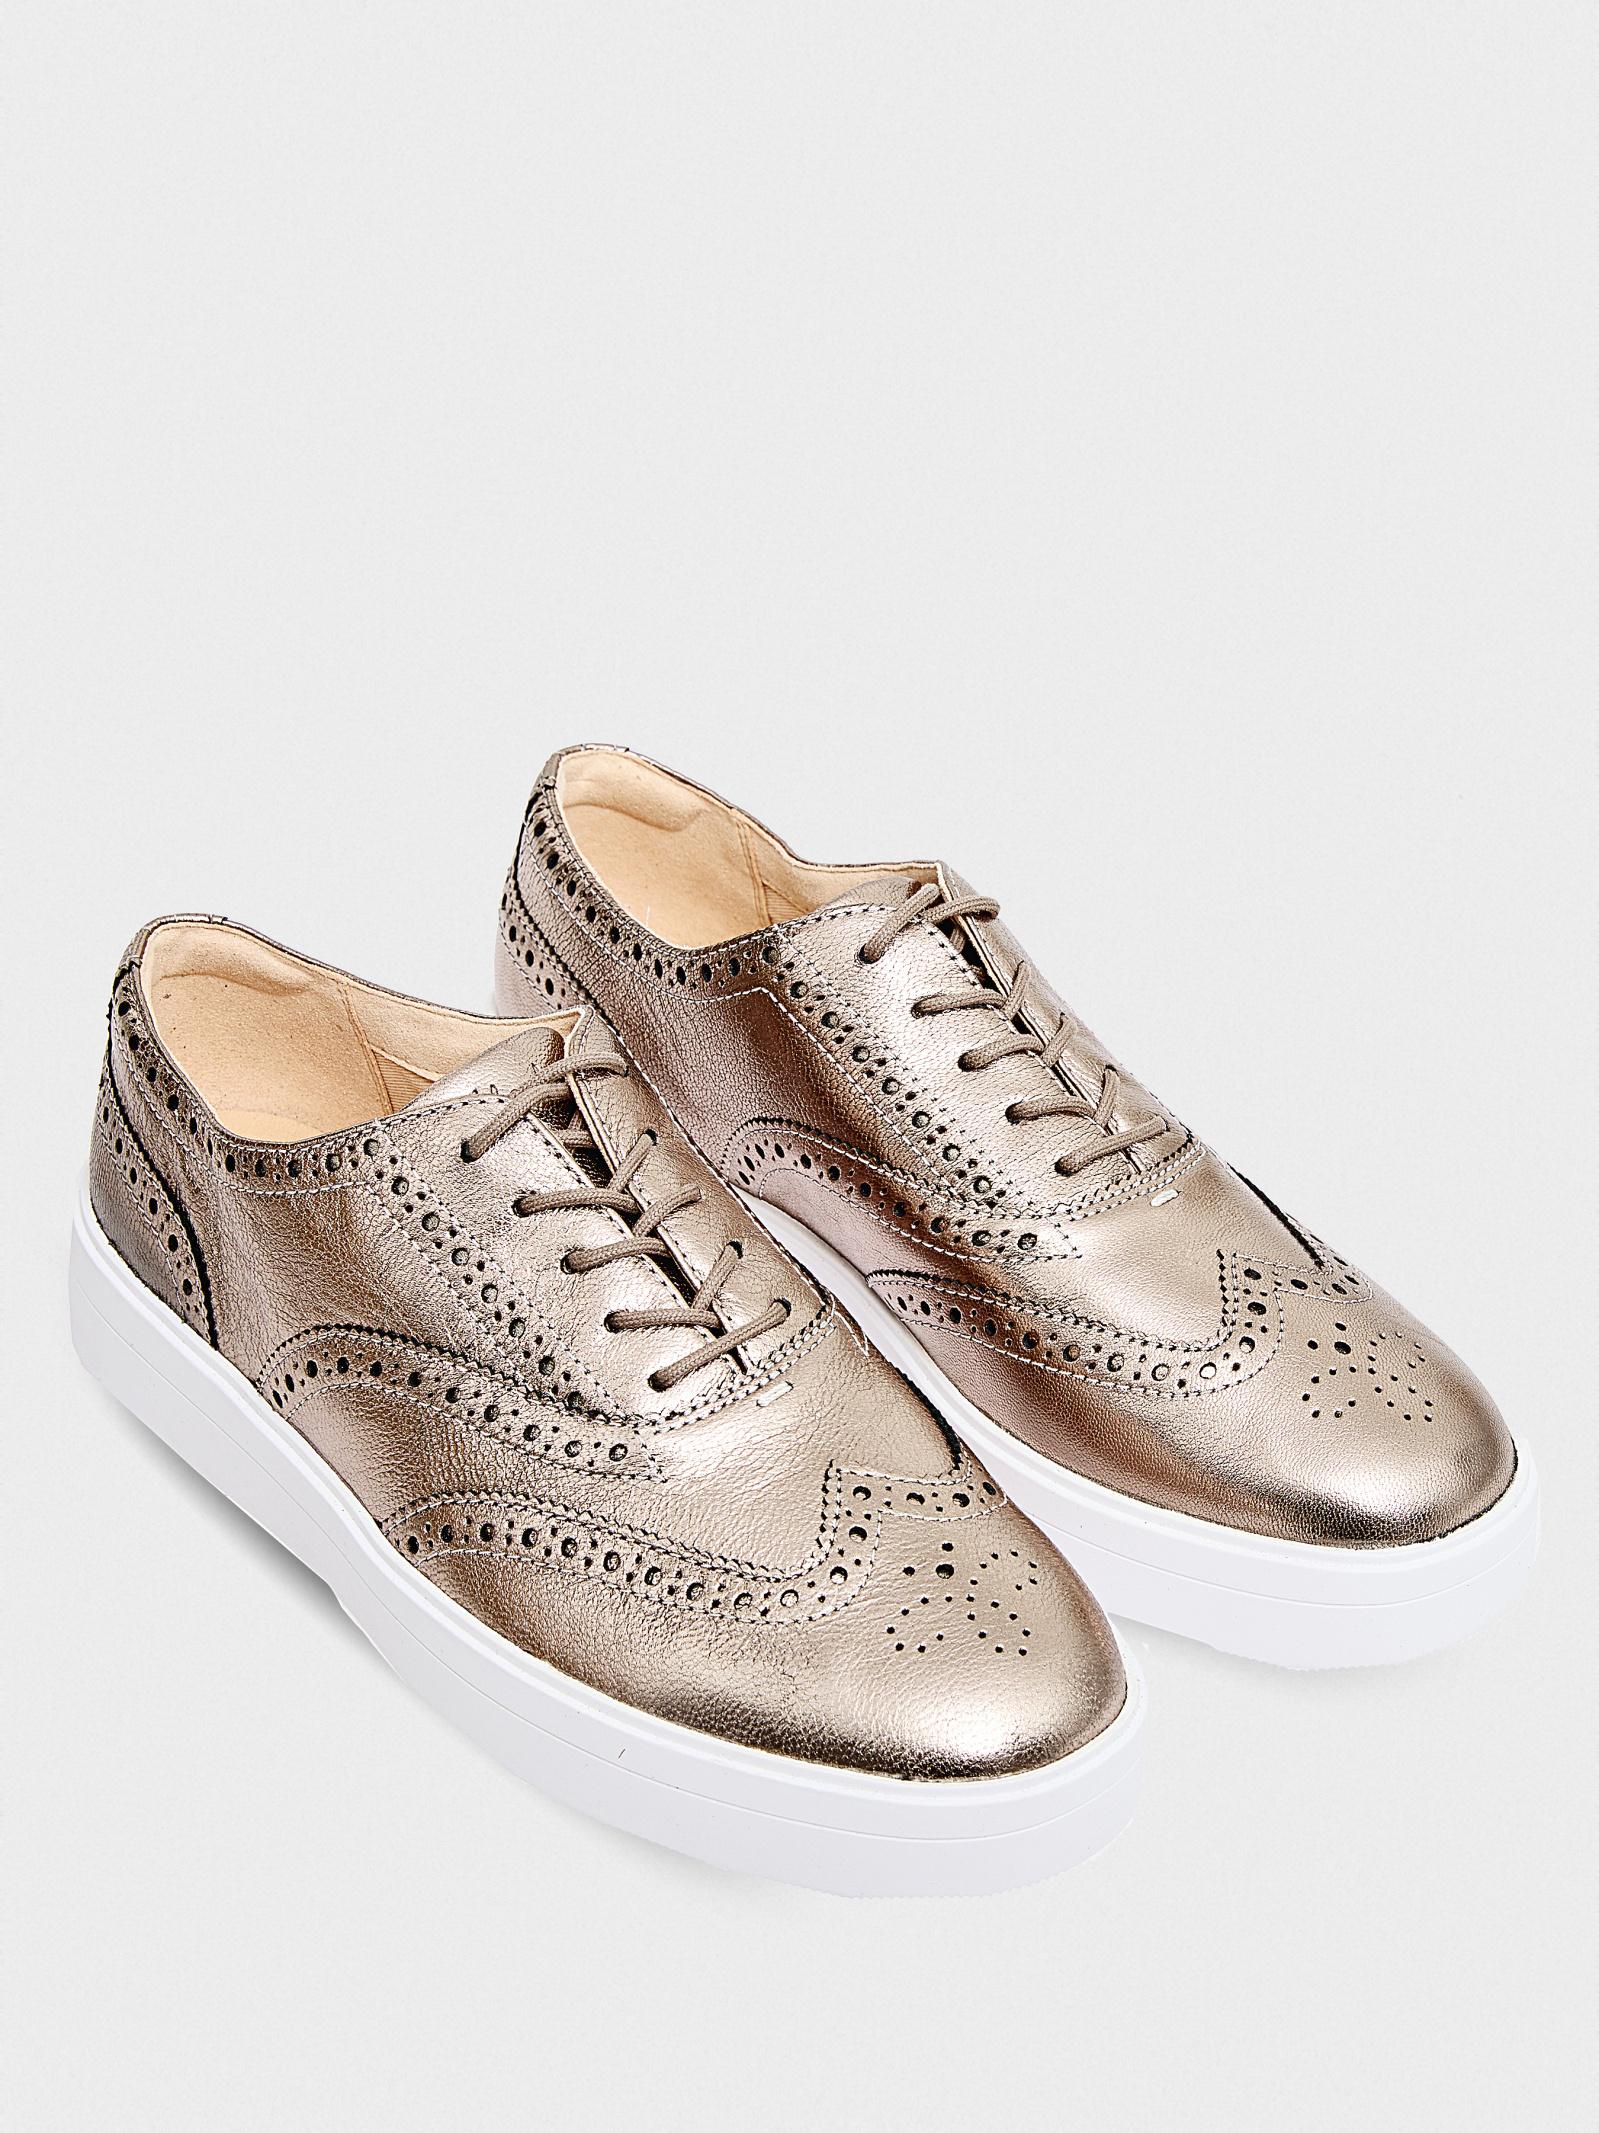 Полуботинки женские Clarks Hero Brogue. 2614-9391 цена обуви, 2017